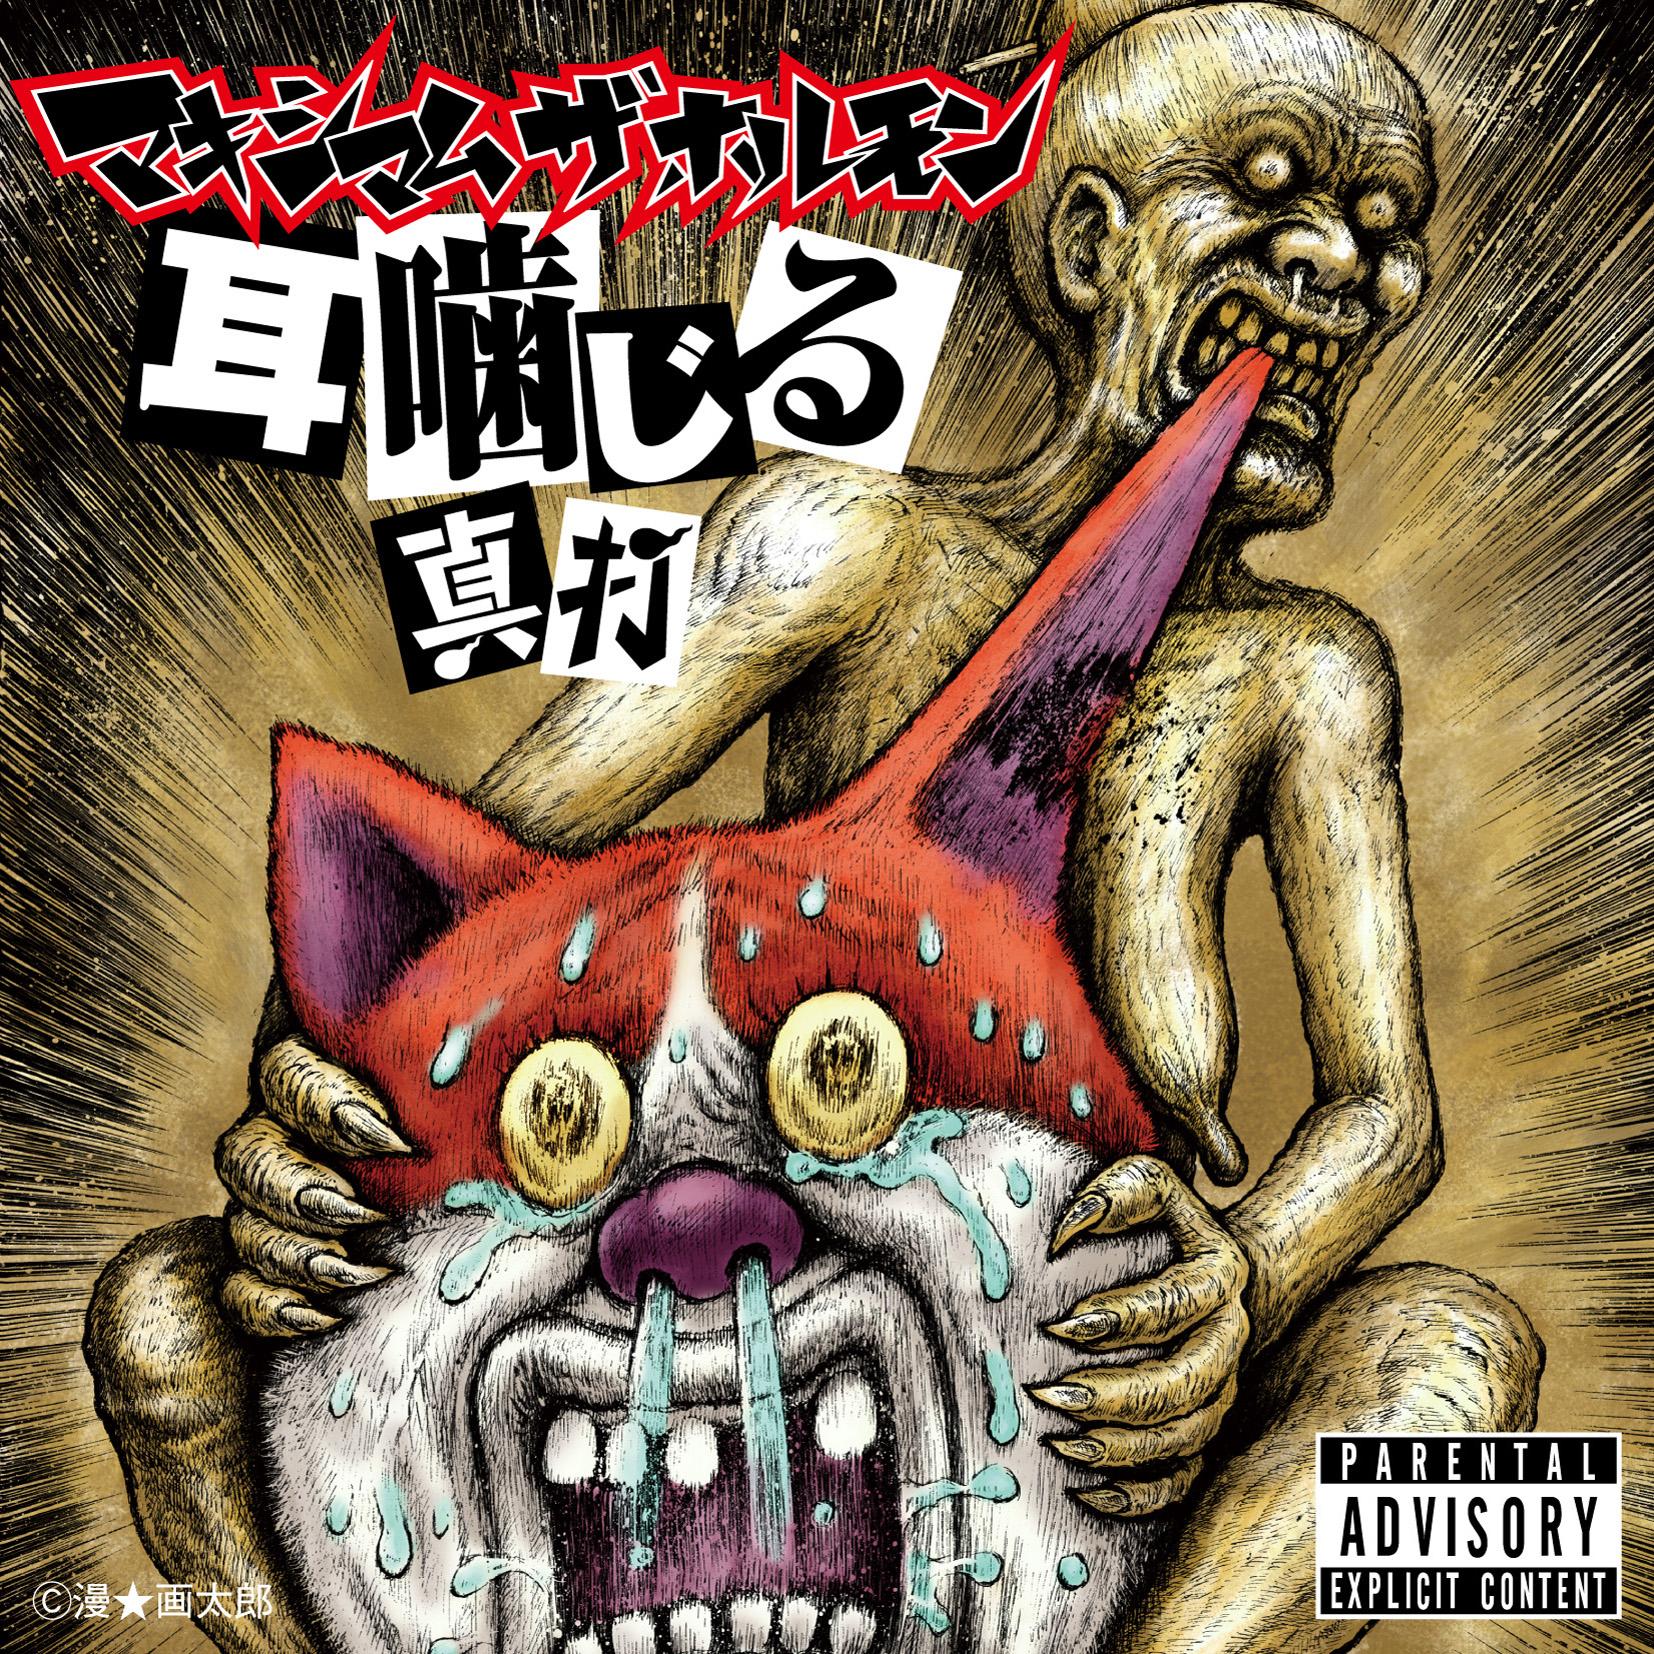 『Deka Vs Deka~デカ対デカ~』同梱される新録版CD「耳噛じる 真打」ジャケット